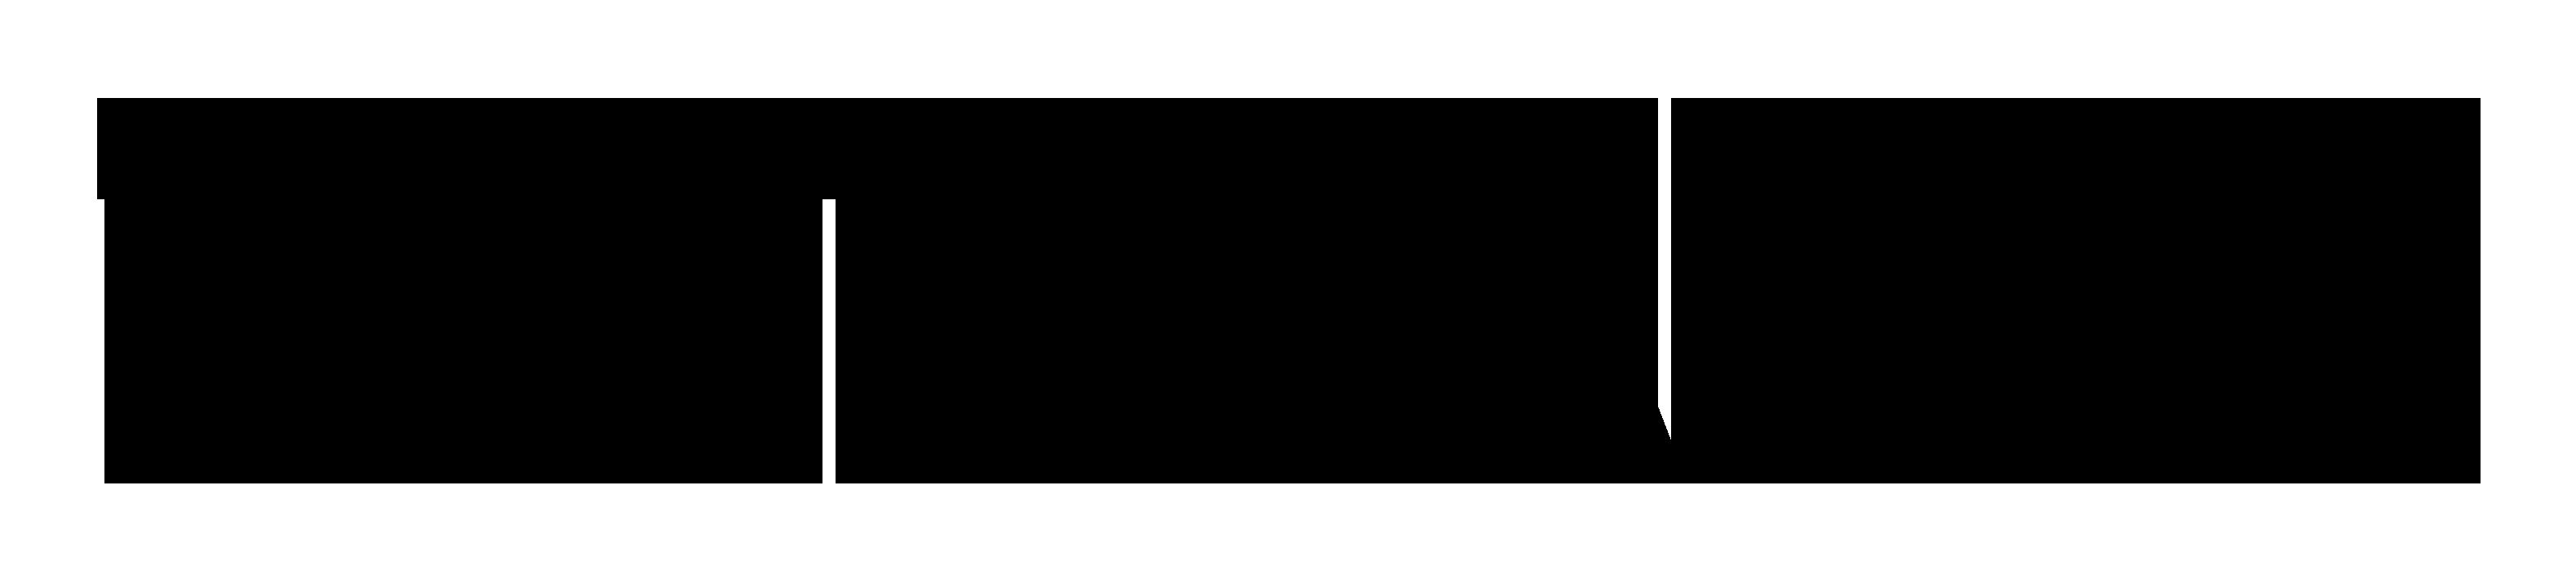 TITAN_RGB_black_transparent.png